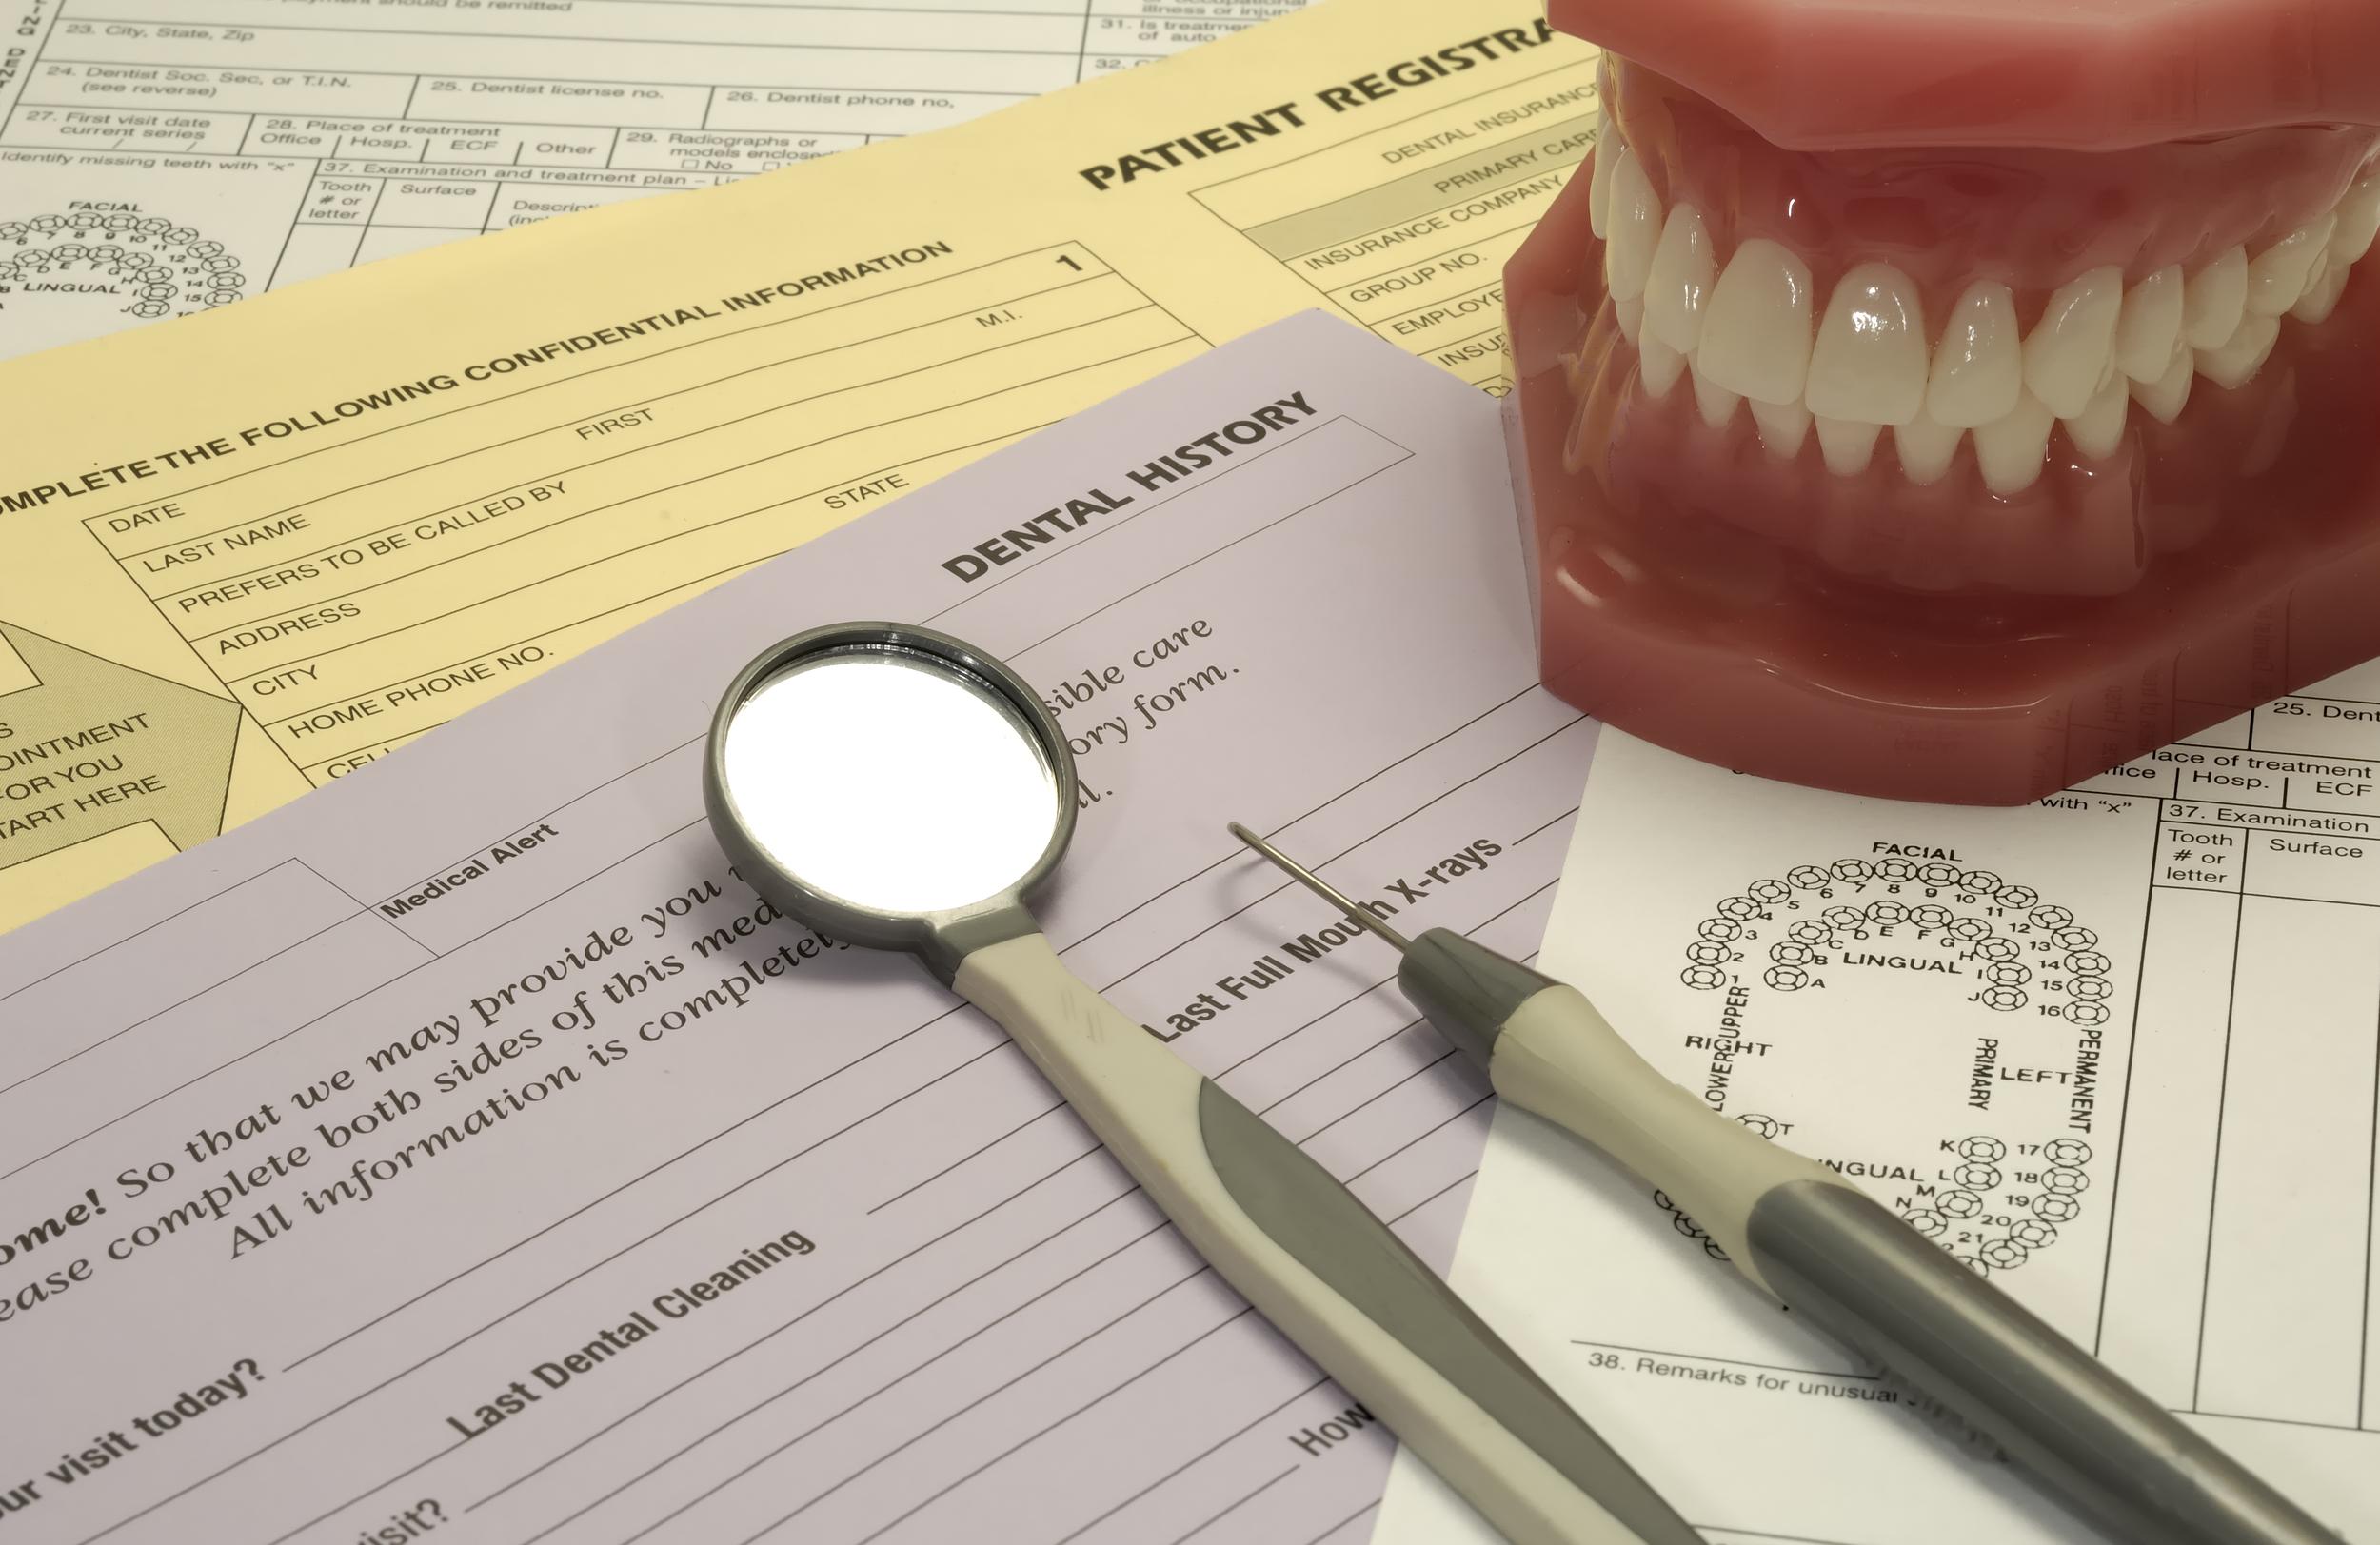 Important Information for Patients Regarding Insurance